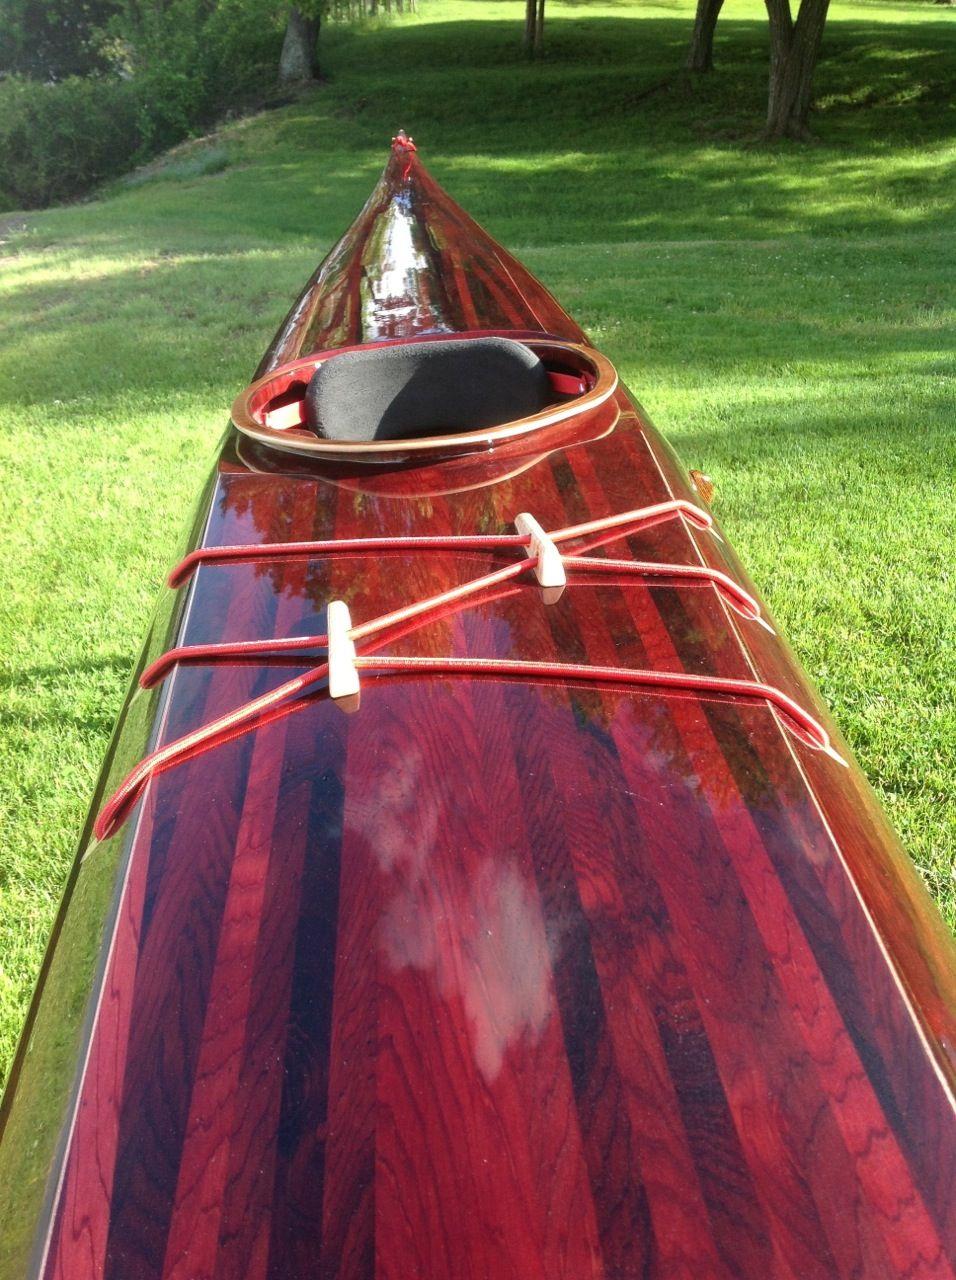 Best Wooden Kayak Wooden Boats Wooden Canoe Kayaking 640 x 480